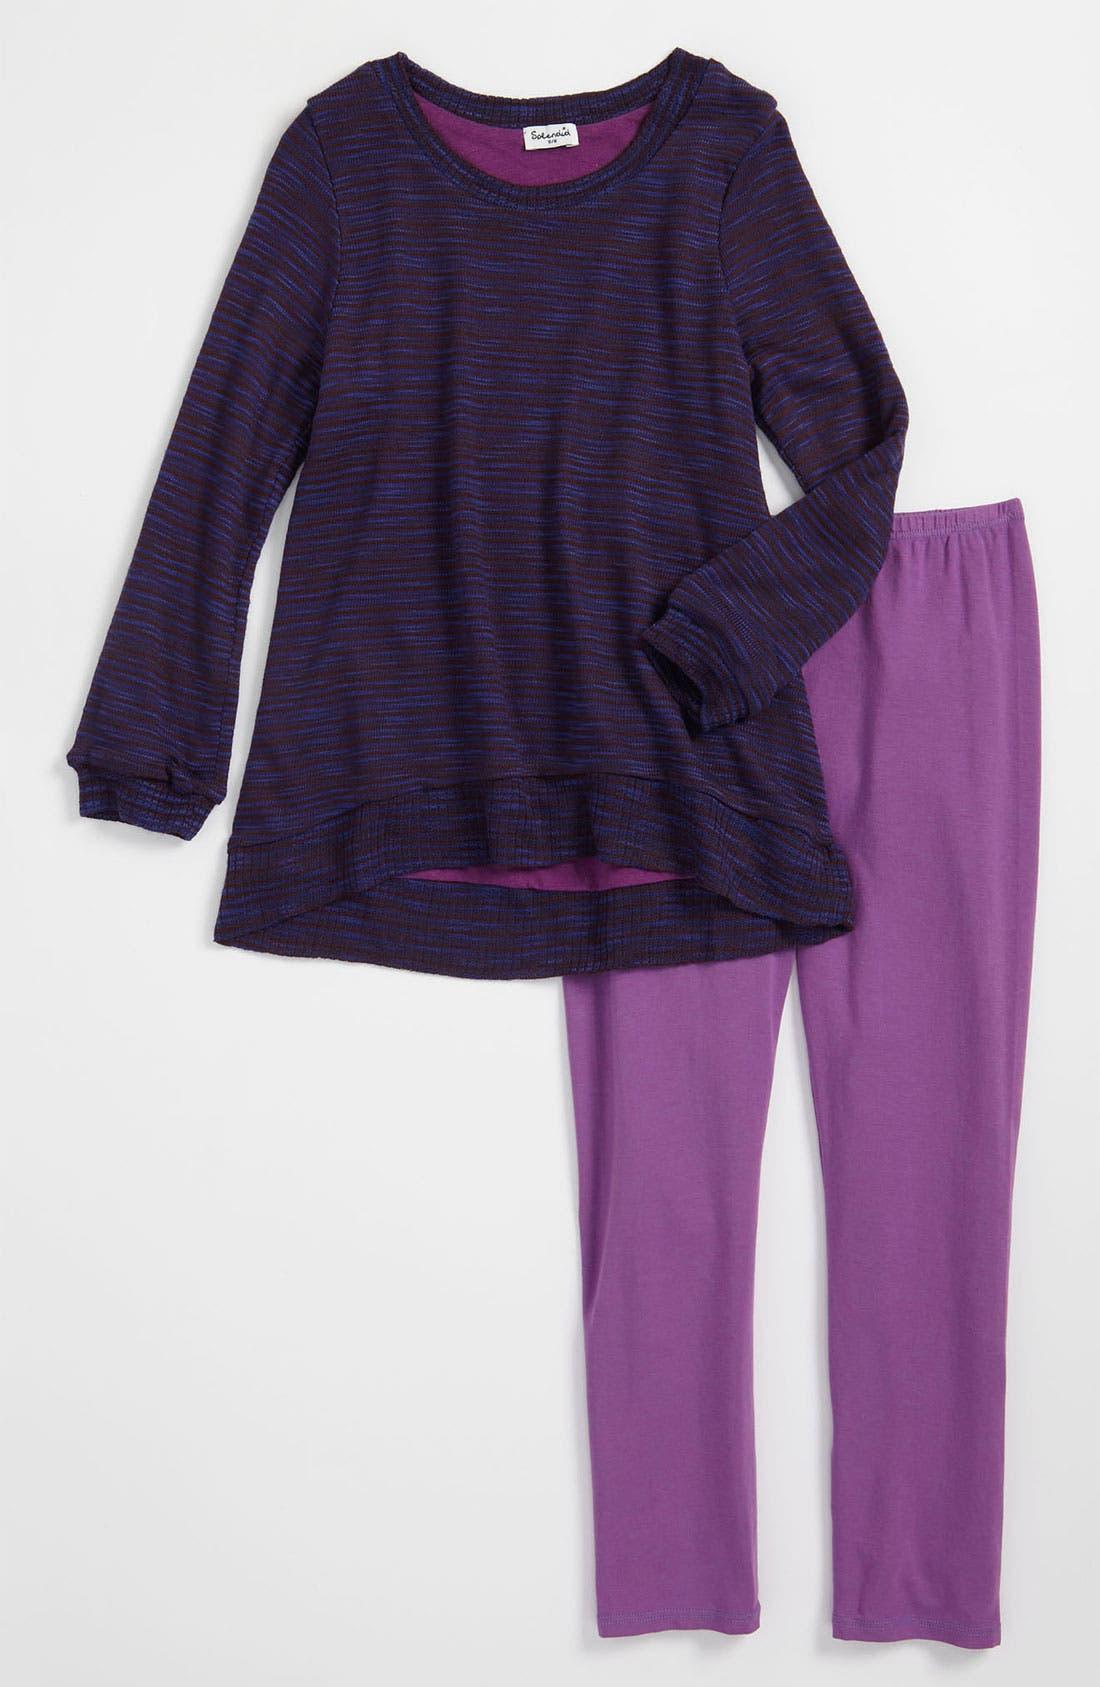 Alternate Image 1 Selected - Splendid 'Feathery' Knit Tunic & Leggings (Little Girls)